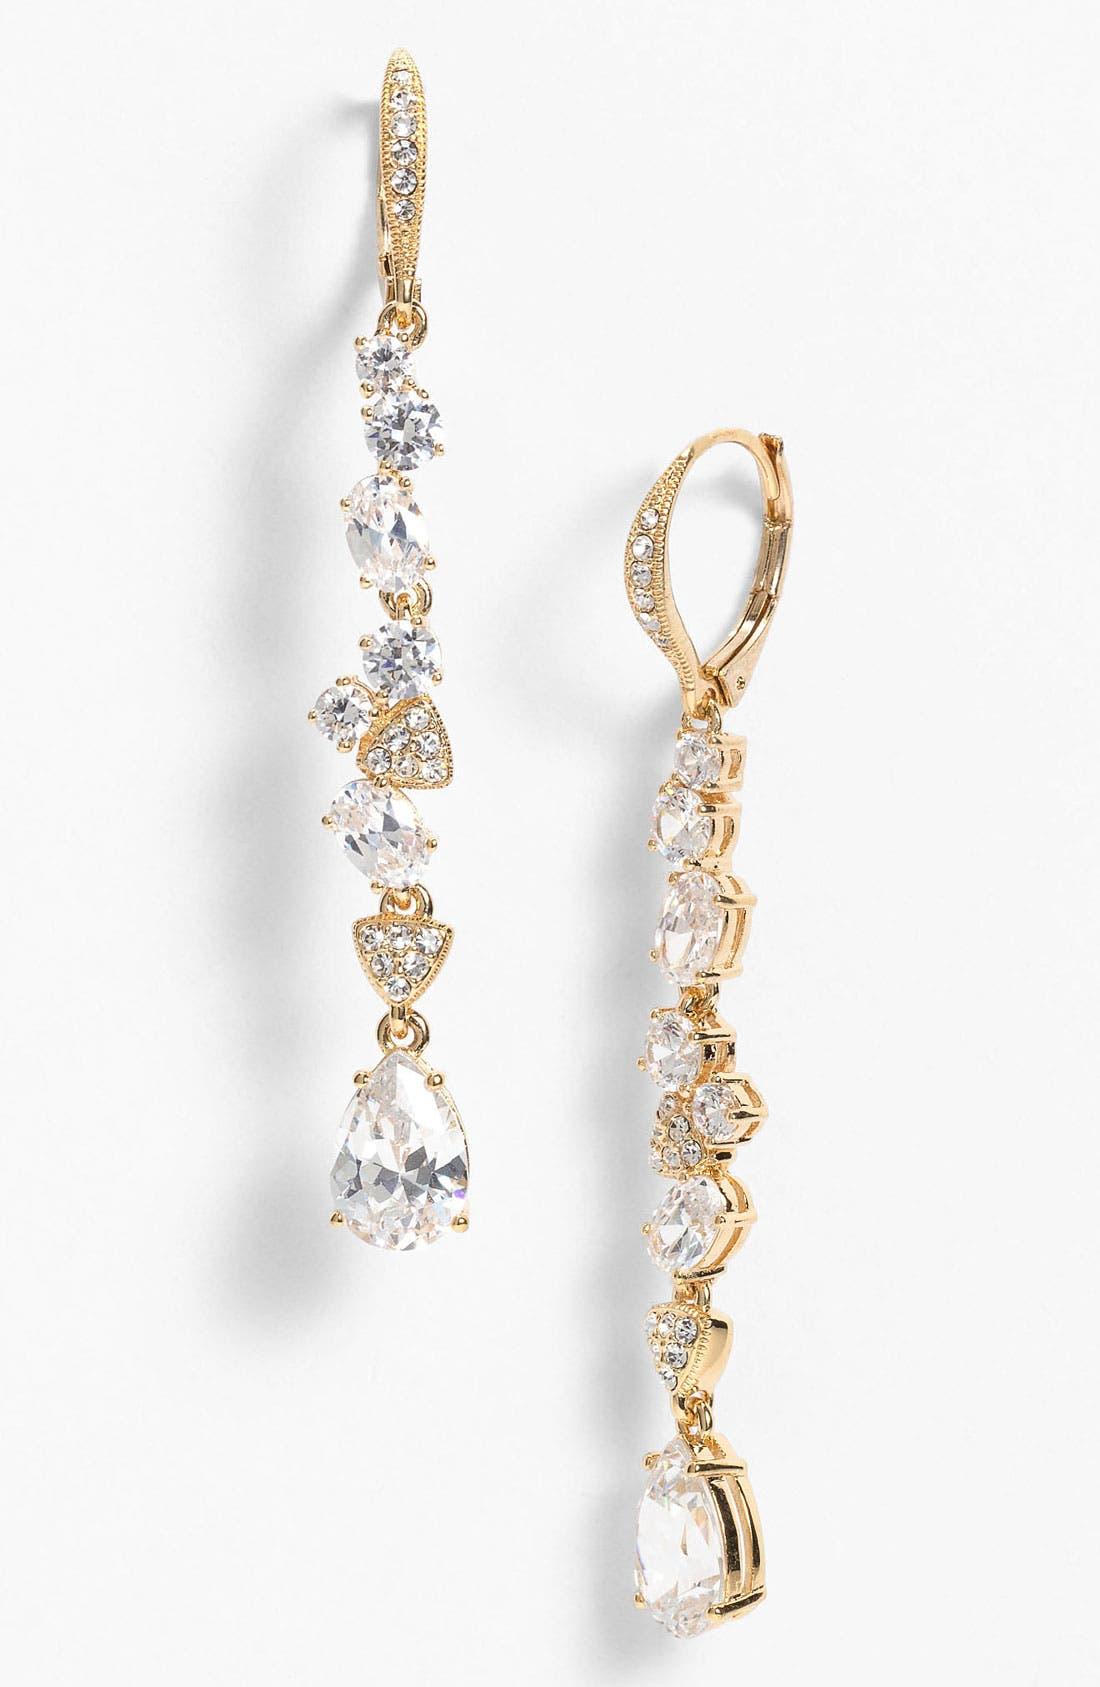 Alternate Image 1 Selected - Nadri Cubic Zirconia Cluster Linear Earrings (Nordstrom Exclusive)